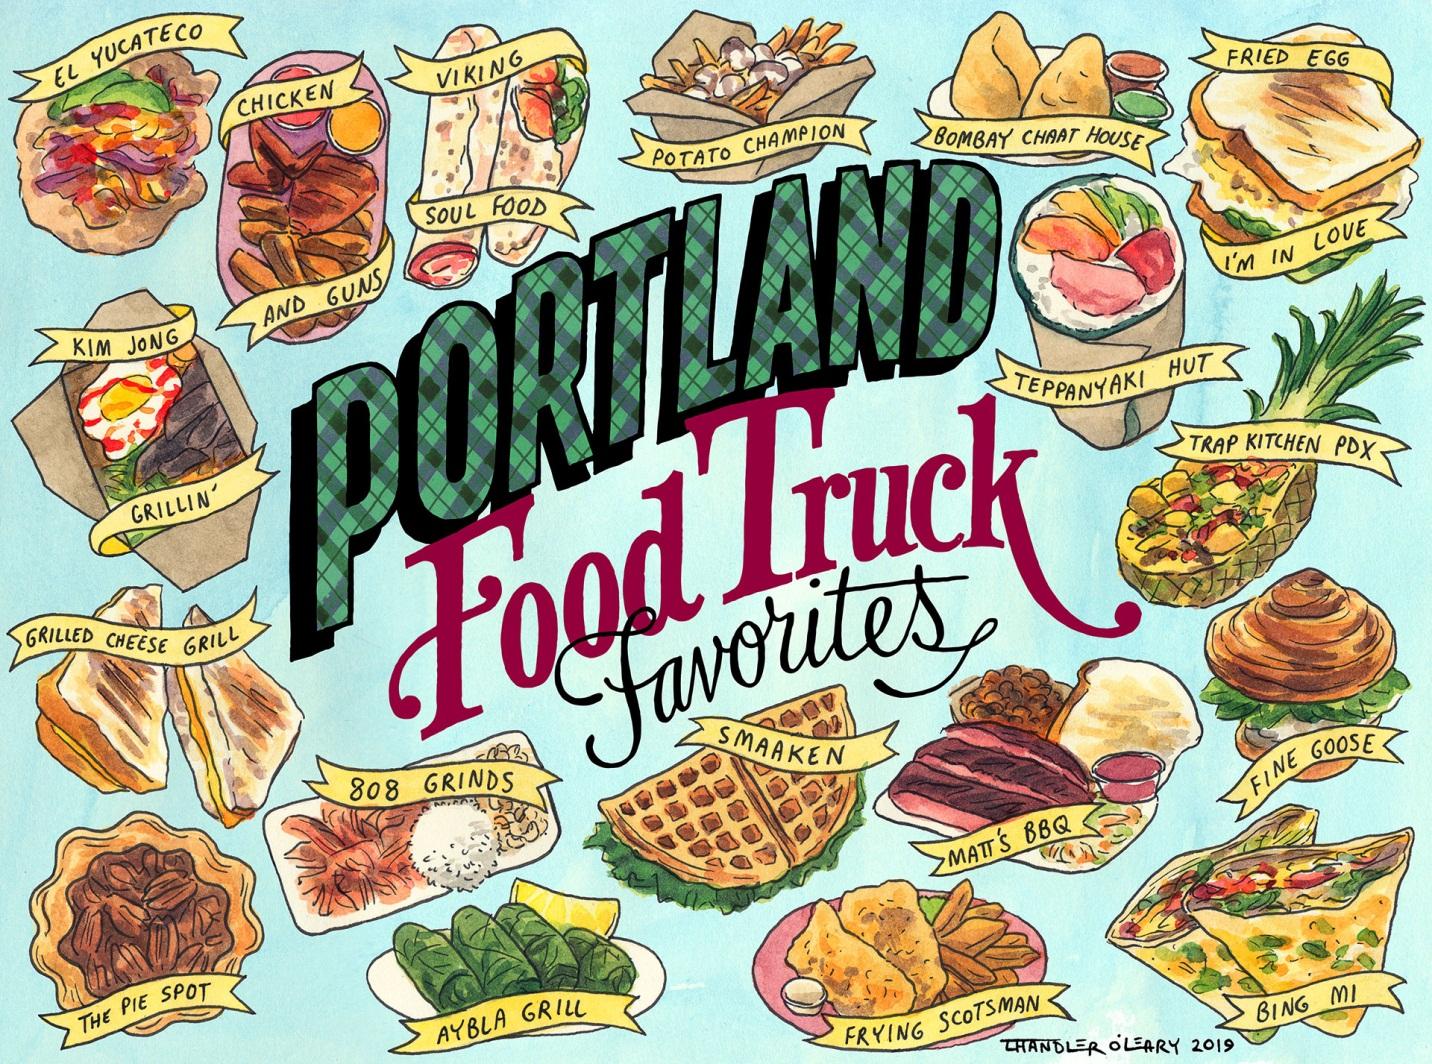 Portland Food Truck Favorites